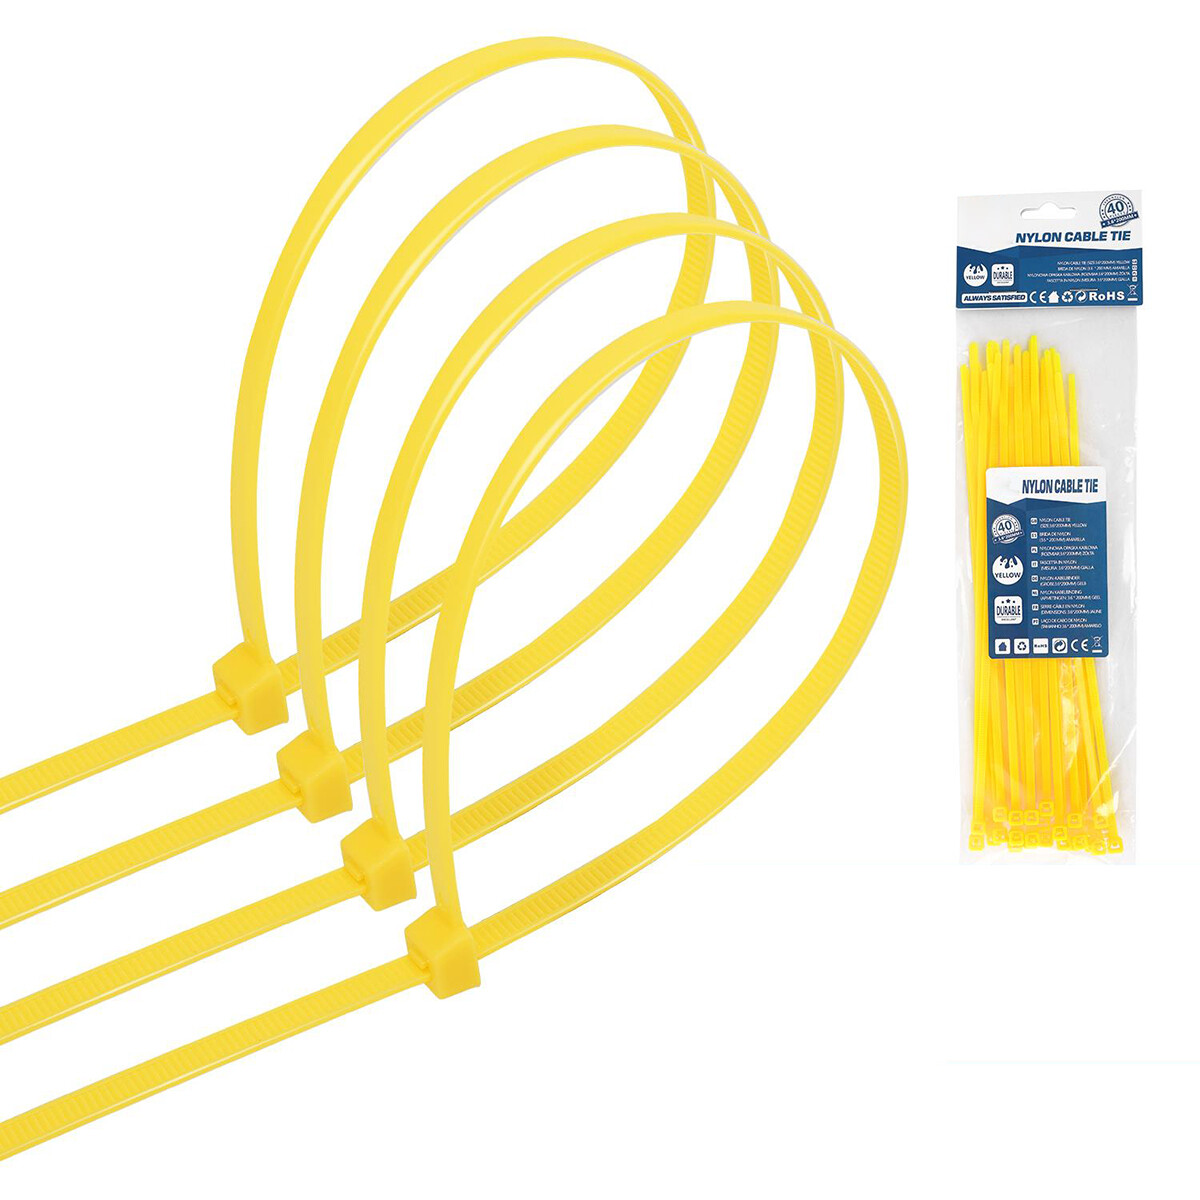 Tie Wraps - Tyrap - Aigi Tie - 3.6x200mm - Geel - 40 Stuks